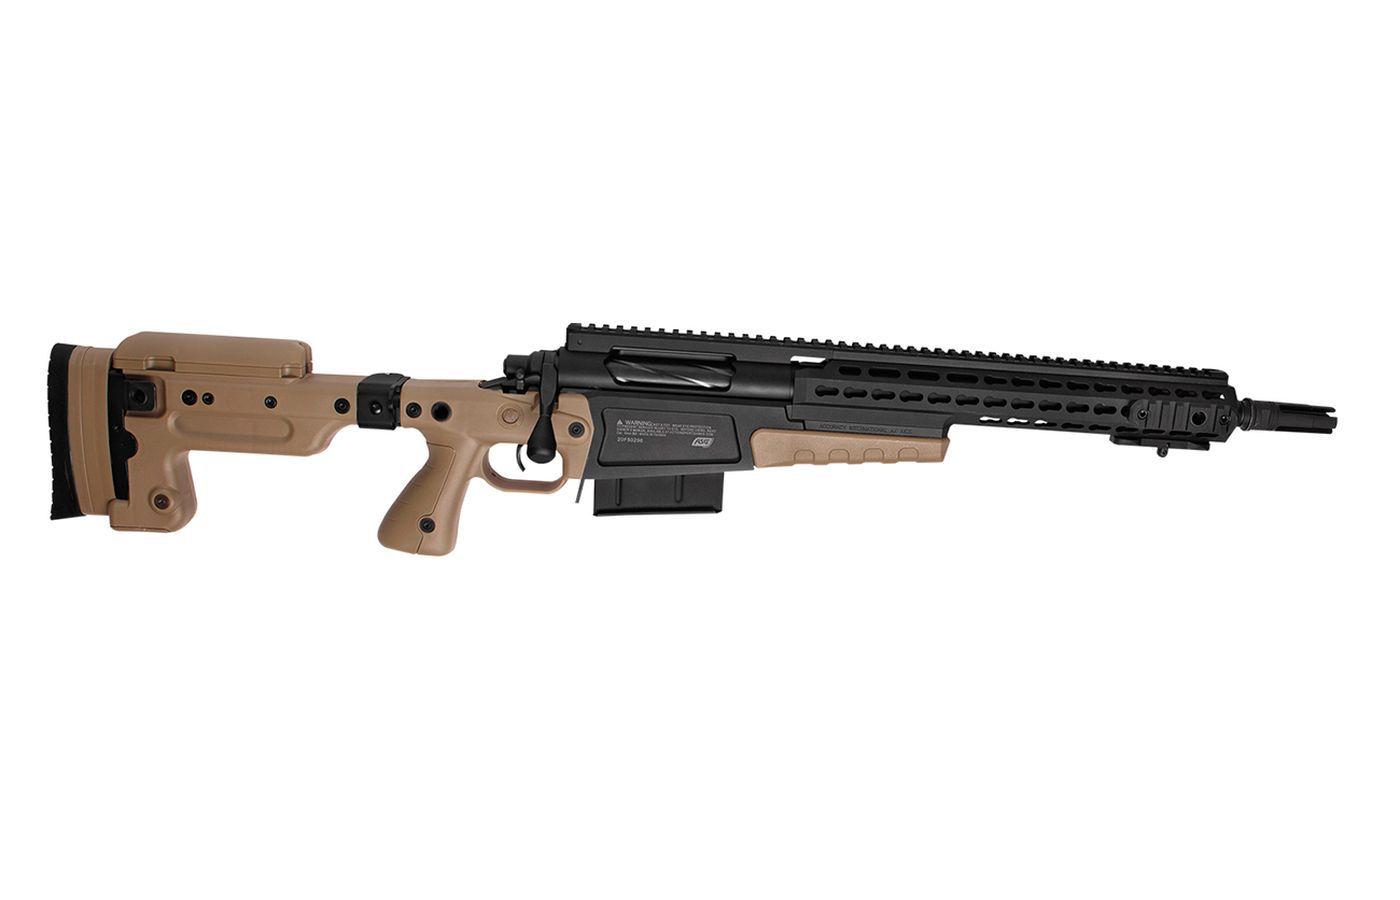 Sniper Airsoft Spring Accuracy International MK13 Compact Noir et Tan